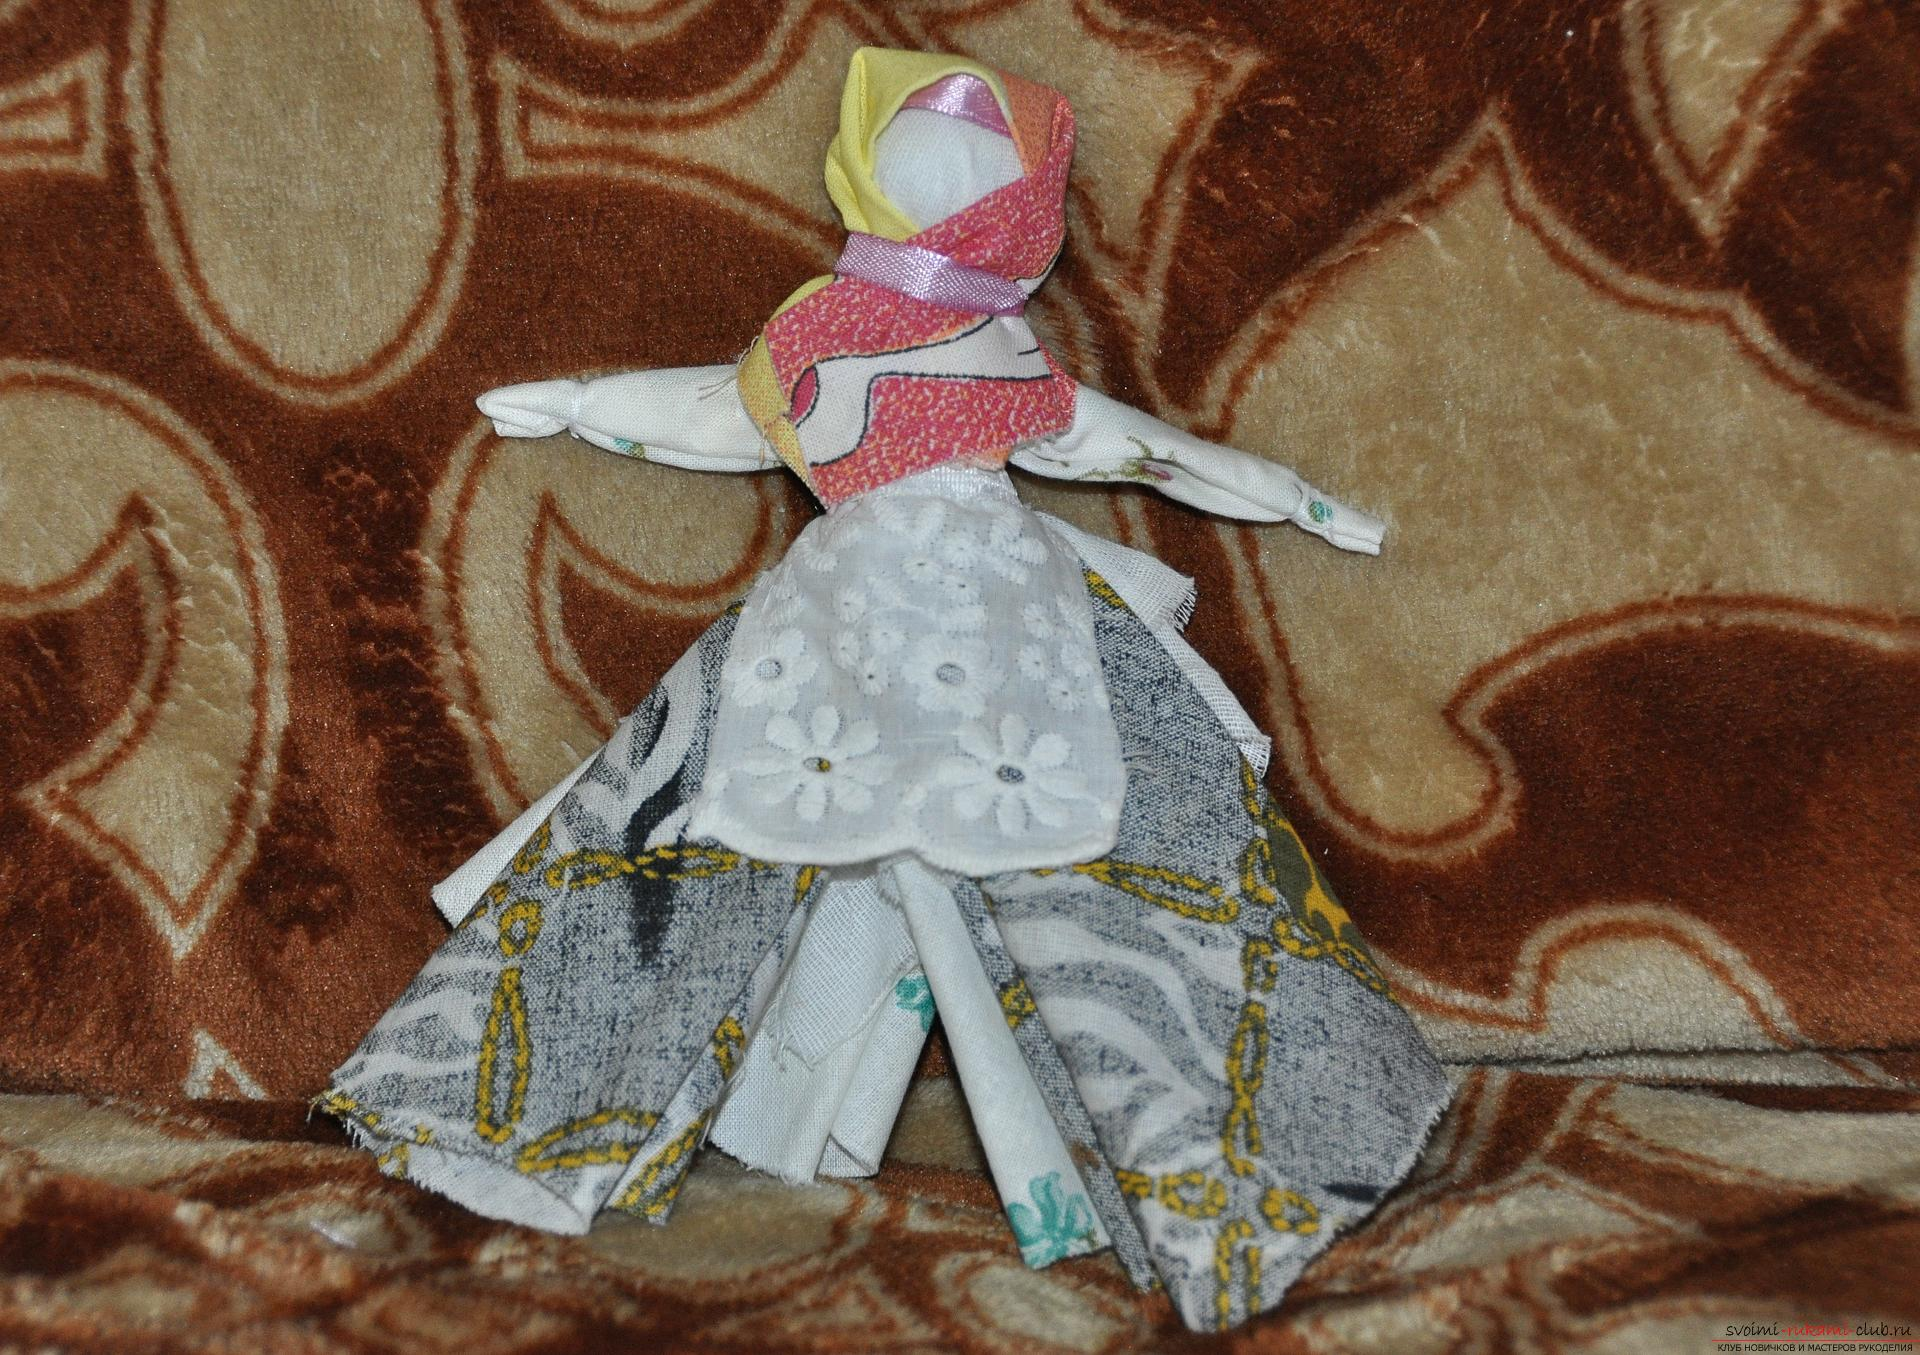 Этот мастер-класс научит как изготовить своими руками куклу-берегиню - столбушку. Фото №1